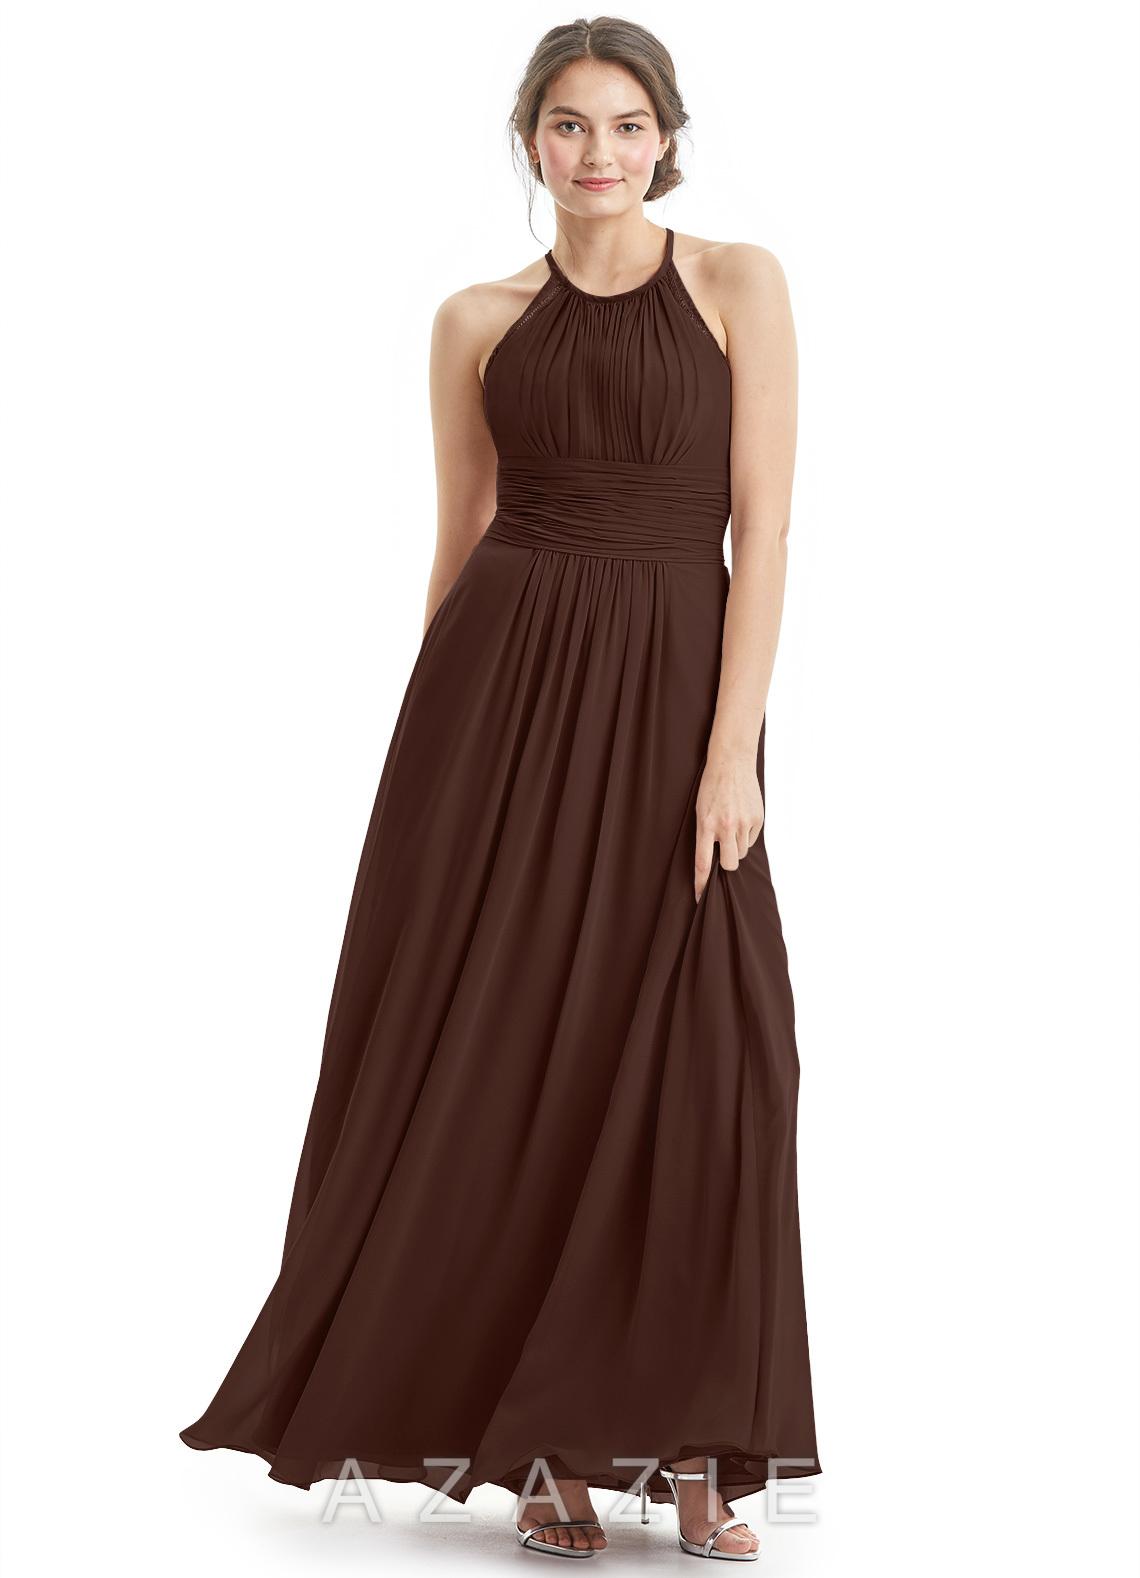 Azazie regina bridesmaid dress azazie color chocolate ombrellifo Choice Image